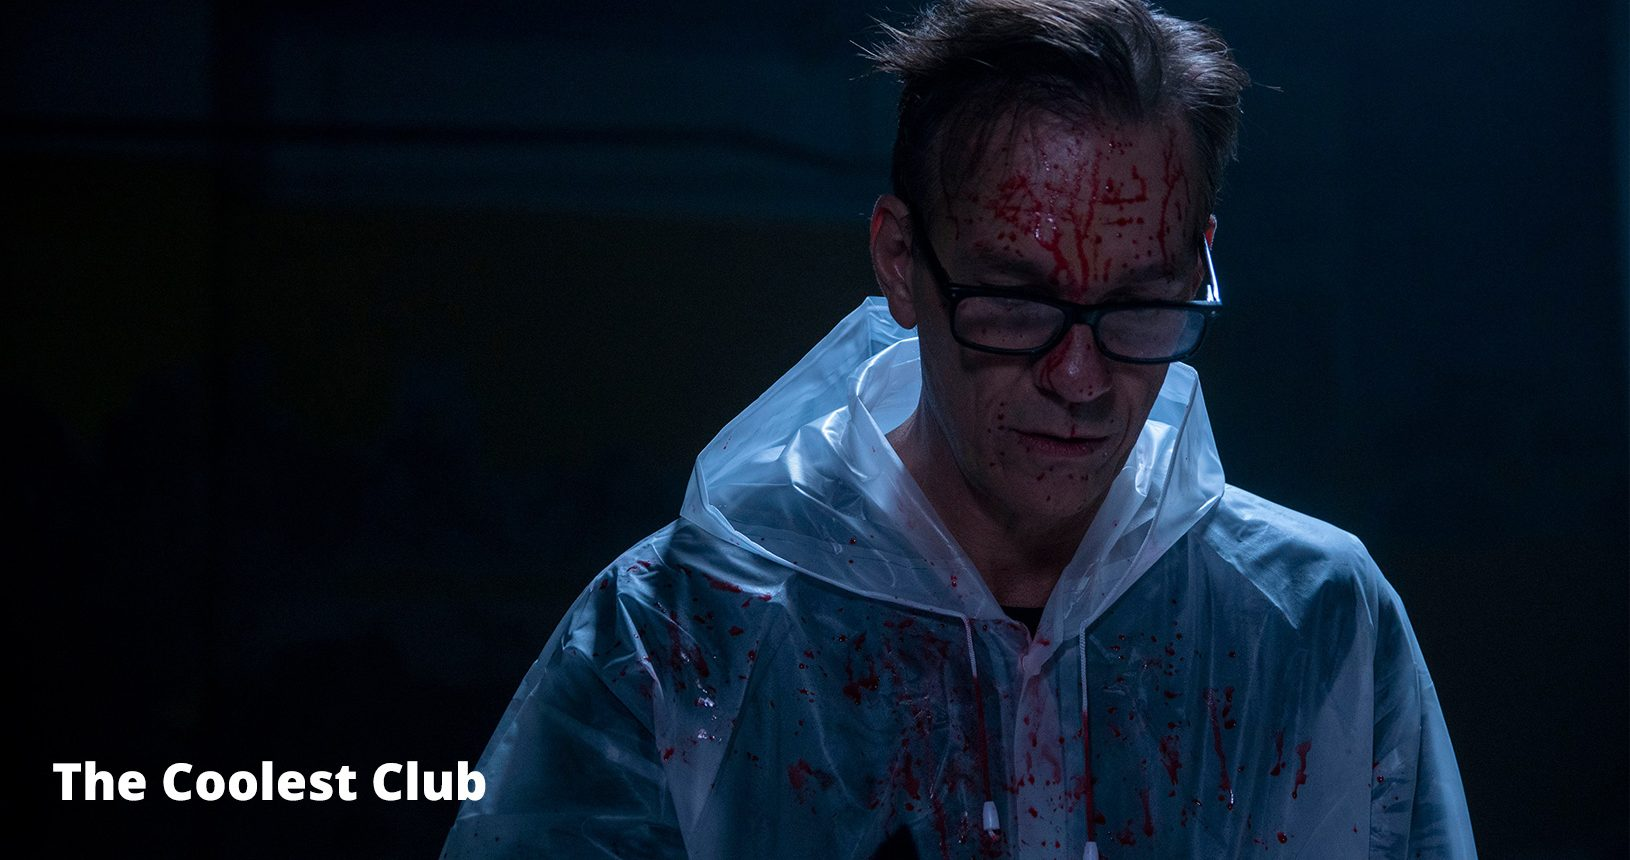 Film: The Coolest Club